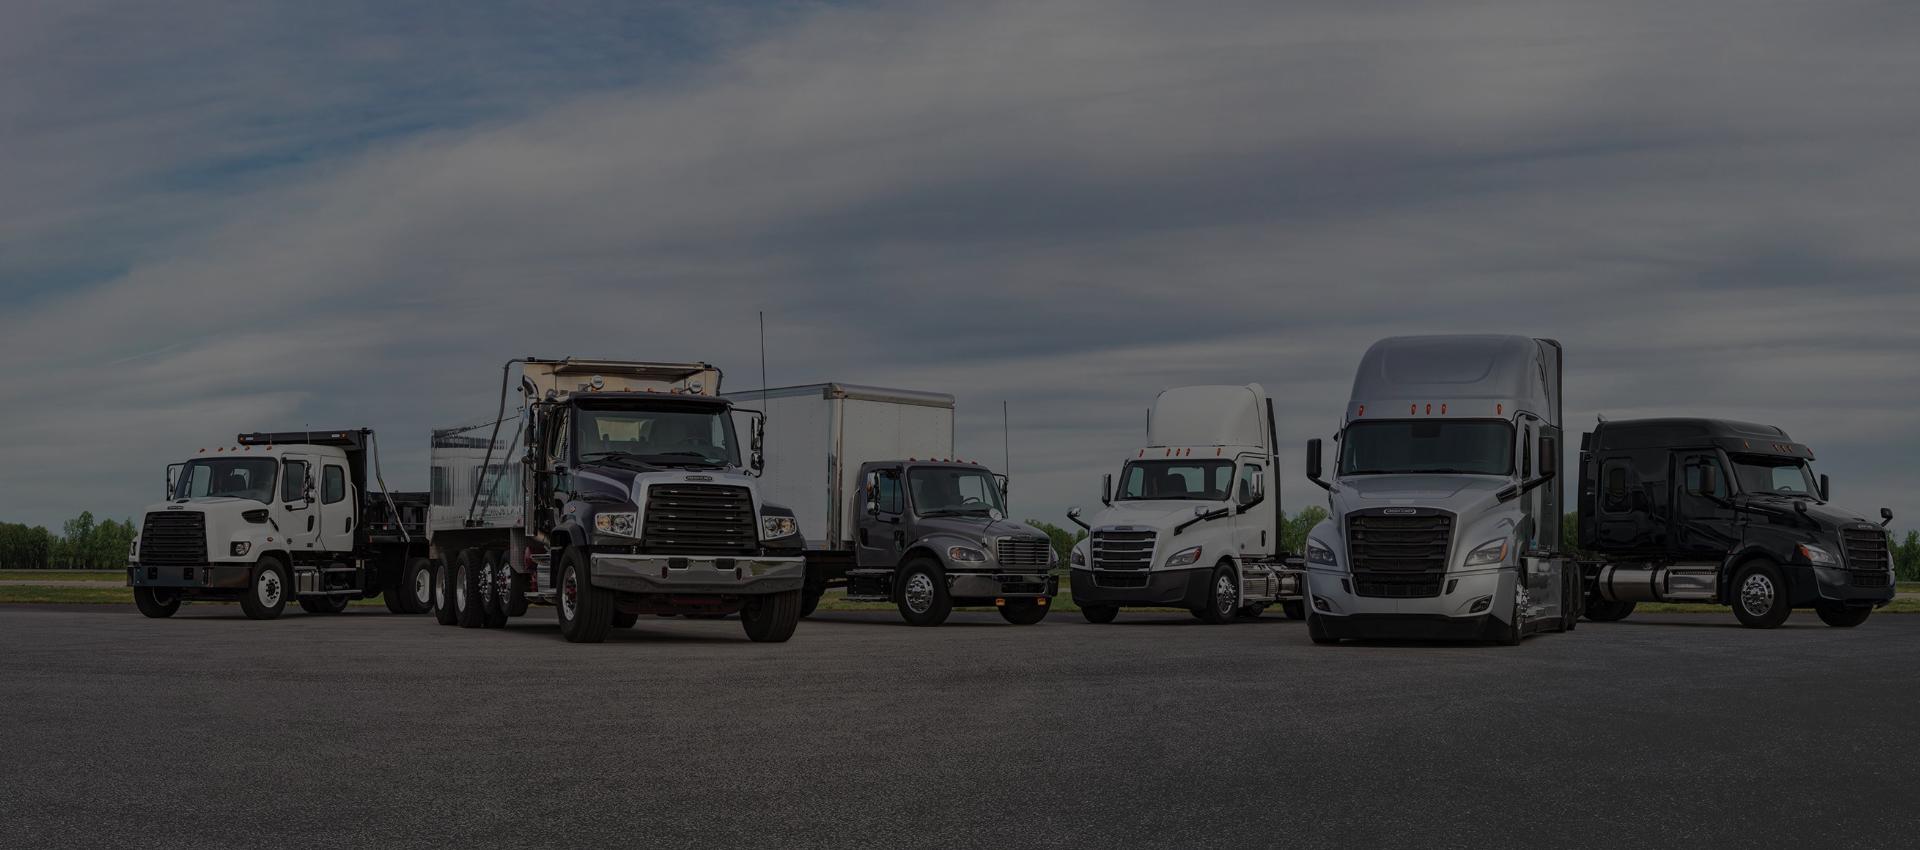 Main lsider Freightliner Truck